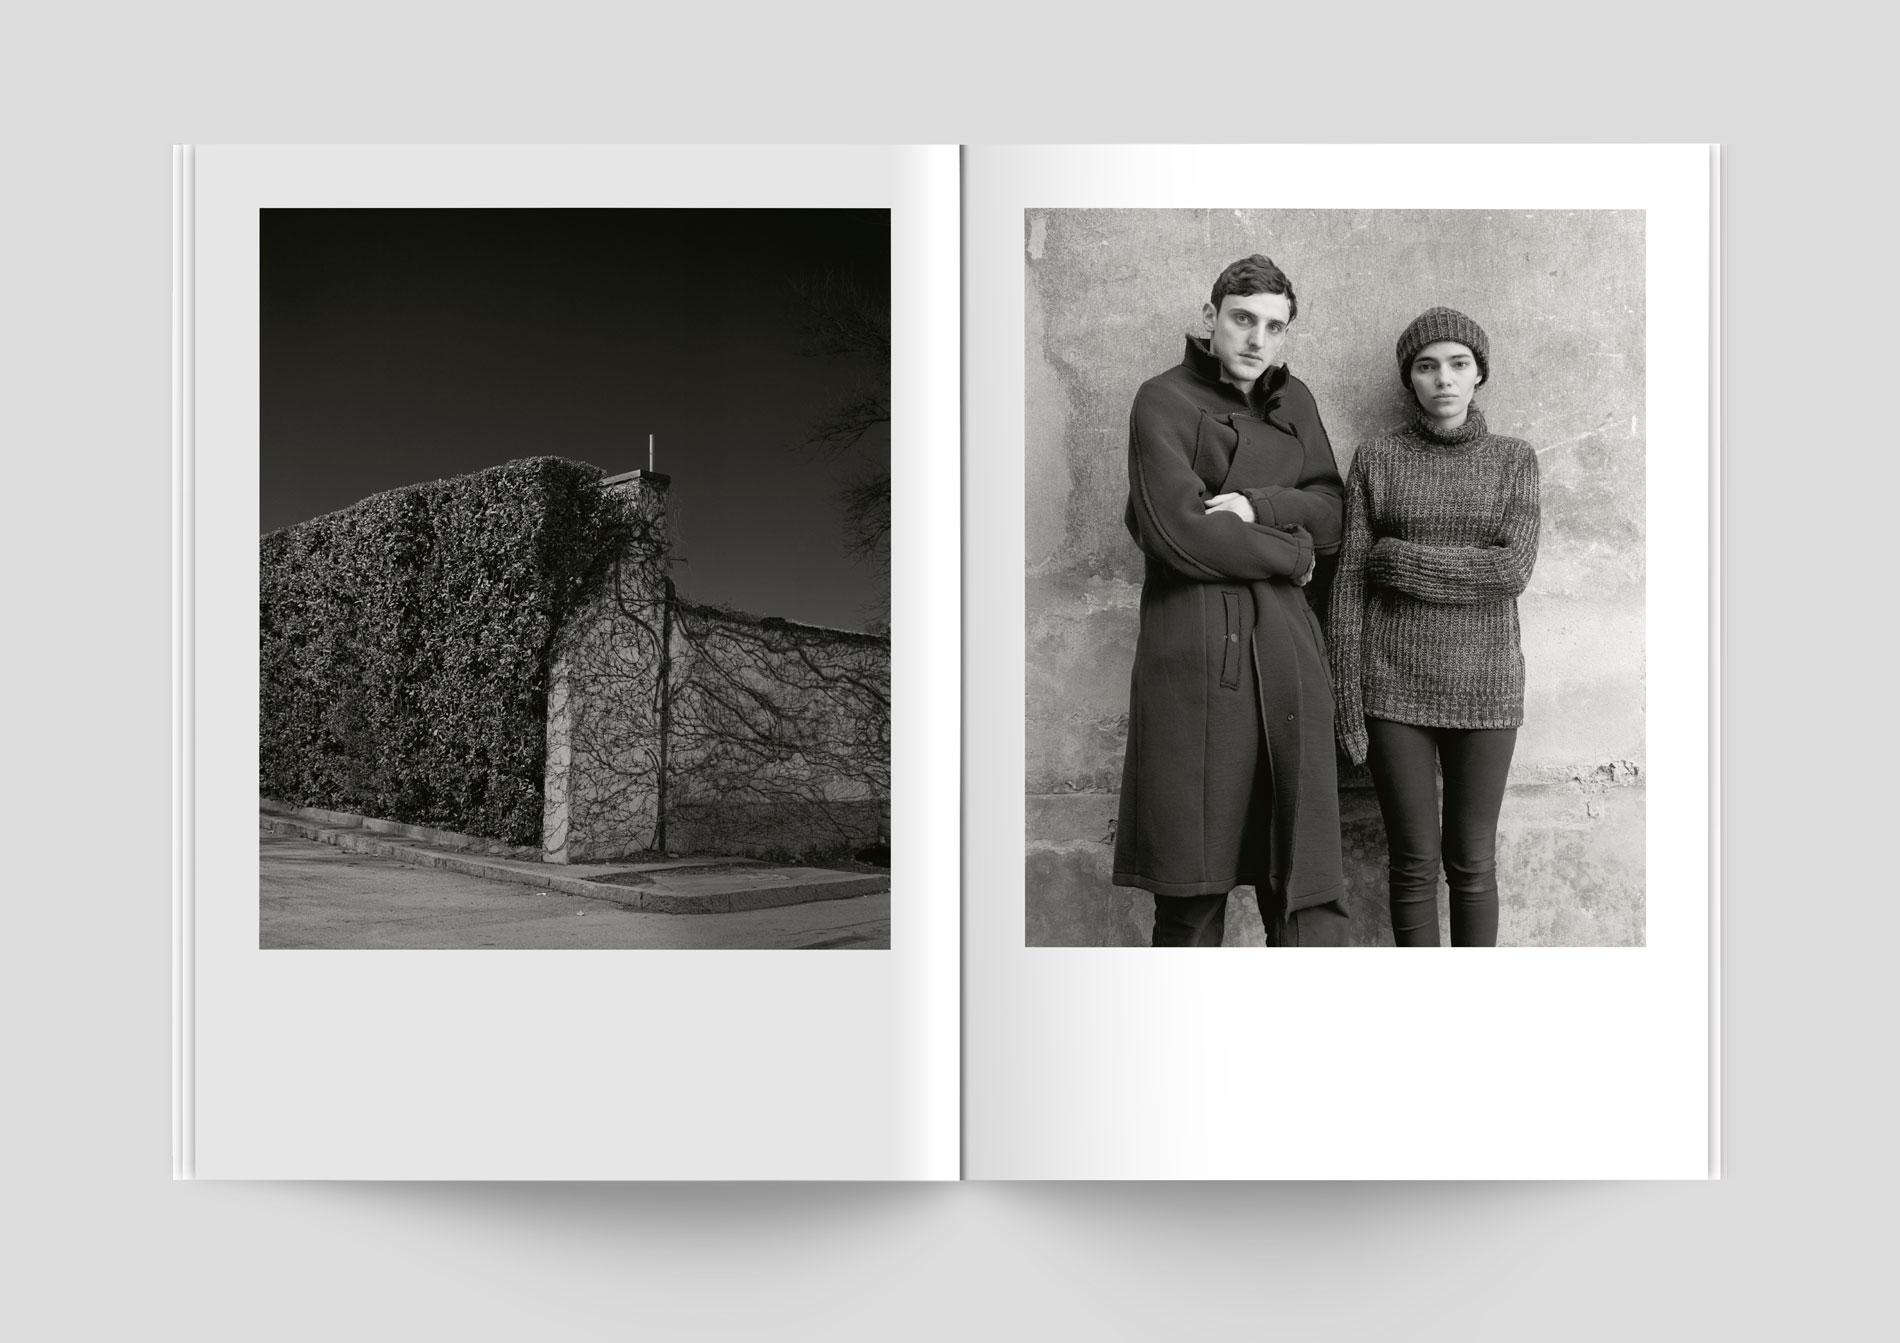 Santoni-Edited-by-Marco-Zanini-Ingar-Krauss-03